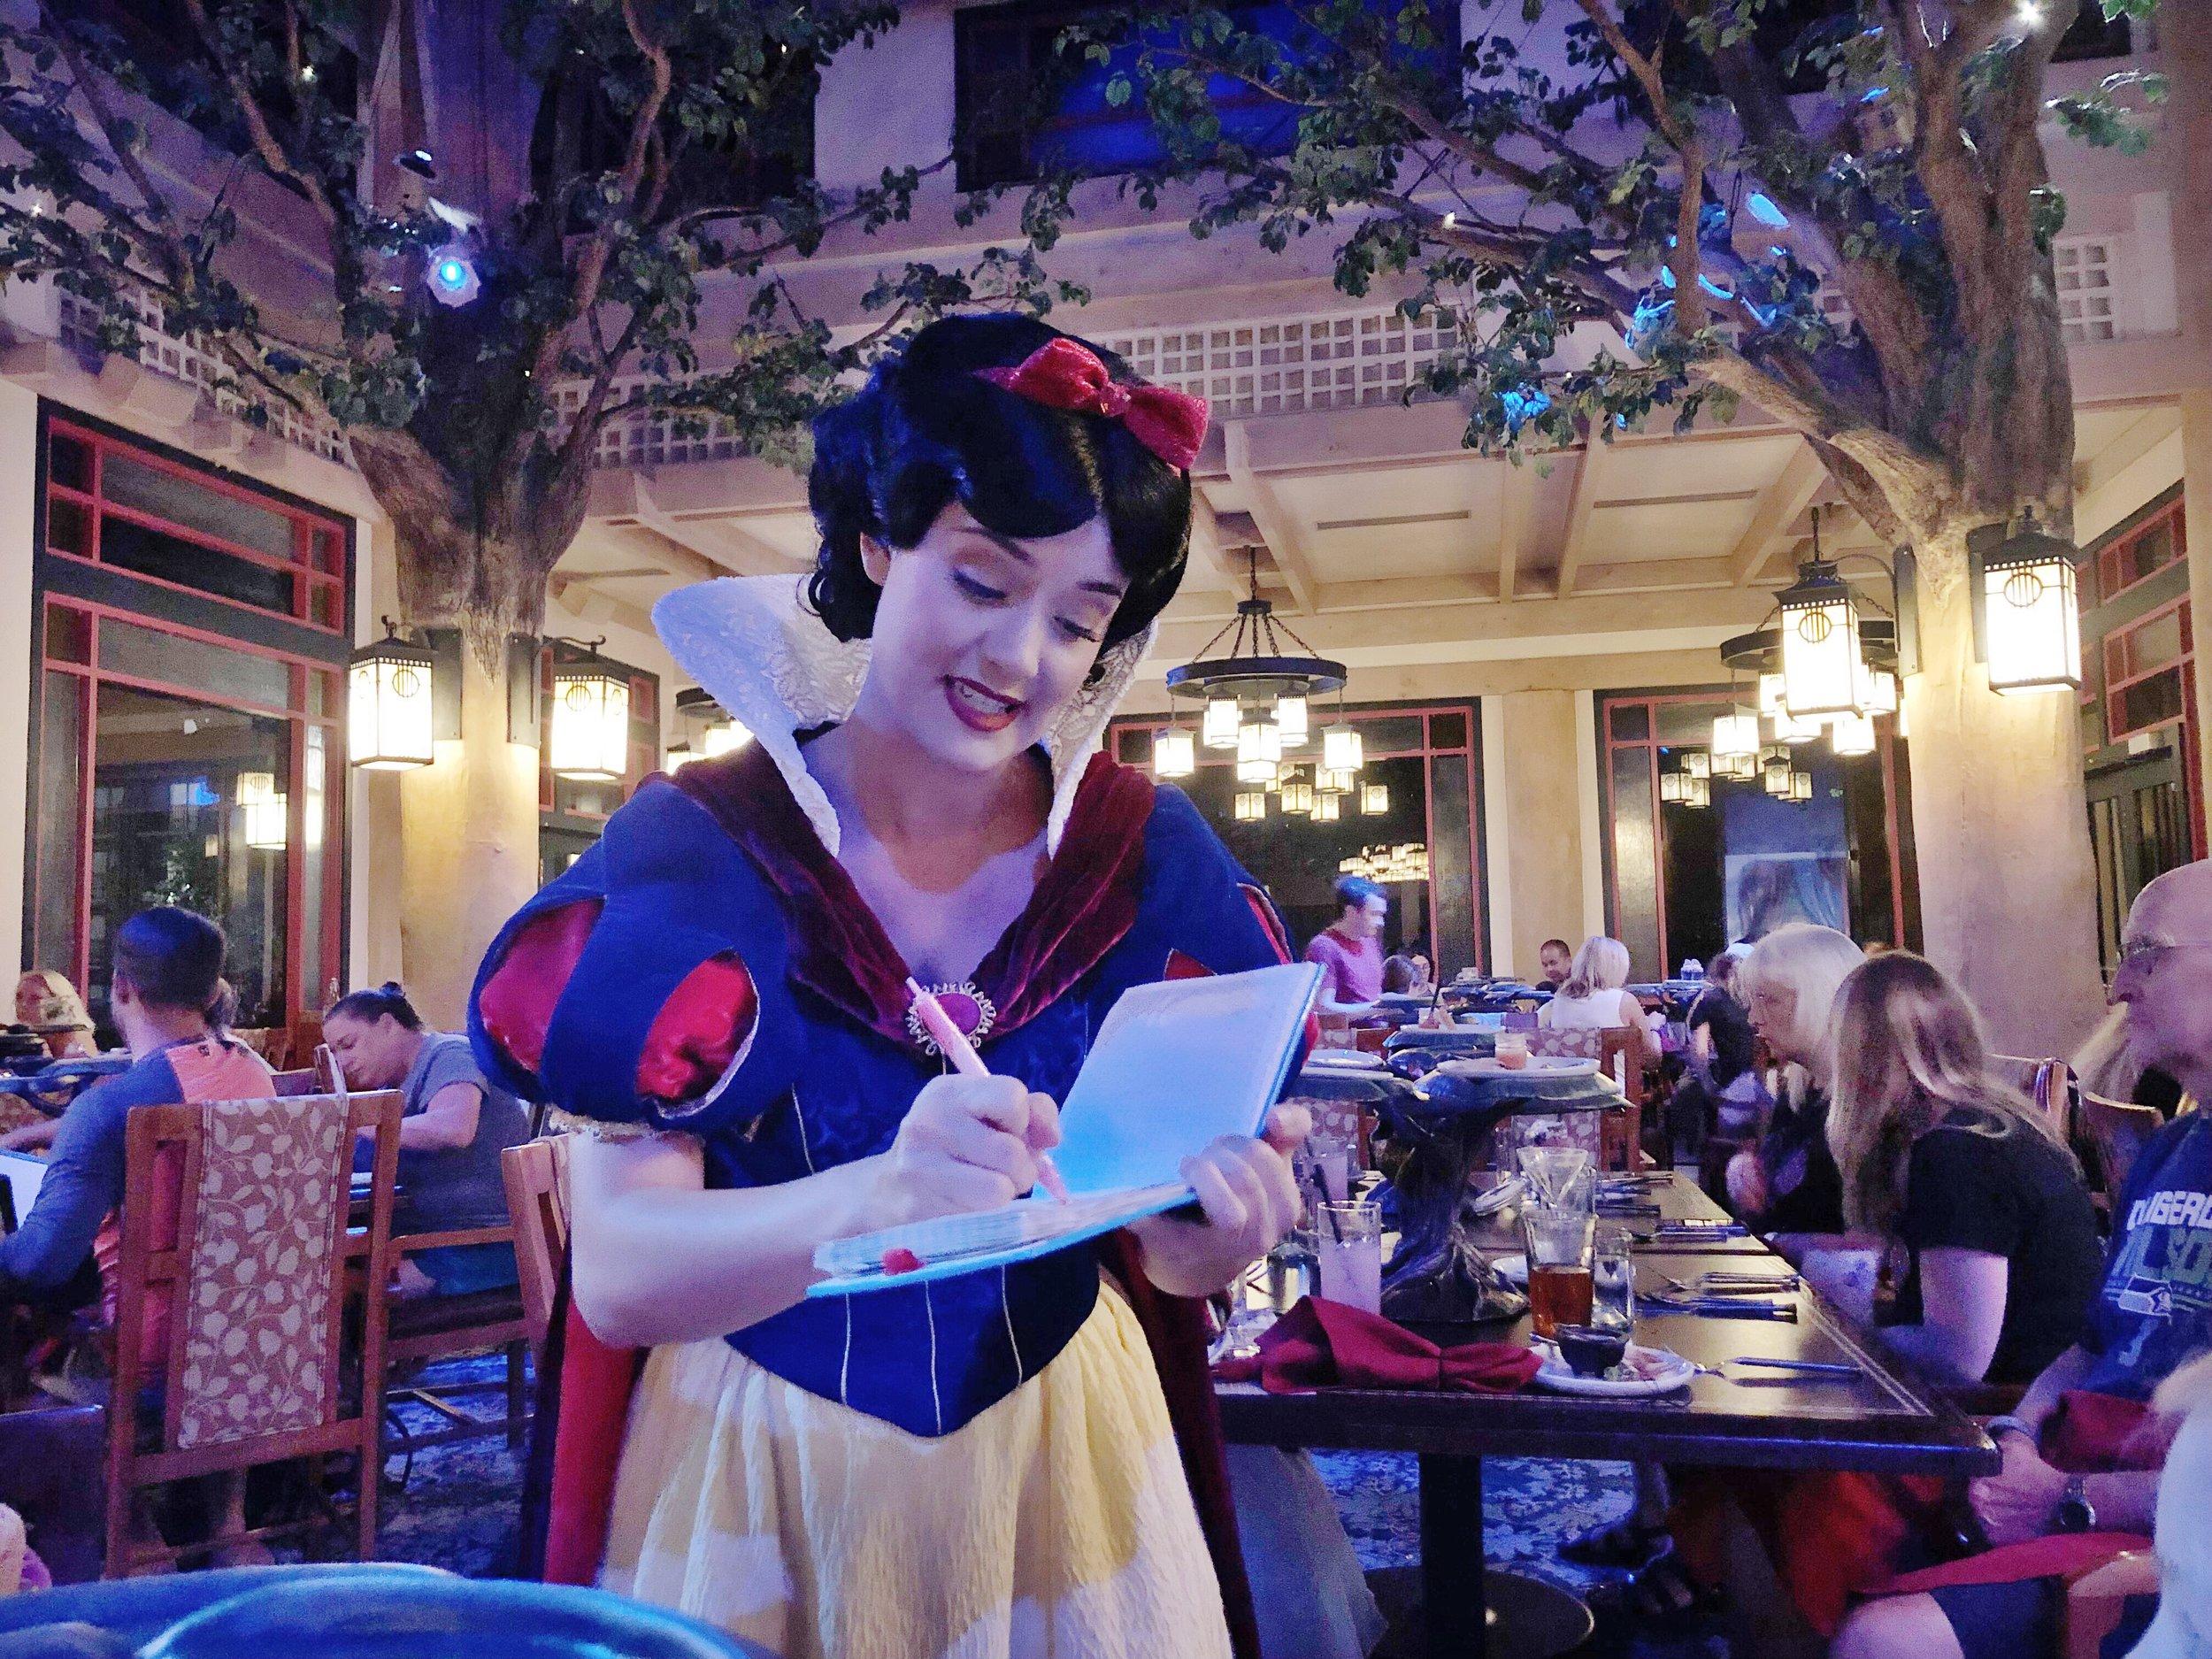 Story Book Dining at Artist Point with Snow White Review. #wdw #DisneyWorld #characterdining #snowwhite #evilqueen #artistpoint #sotrybookdining #waltdisneyworld #disney #disneywithkids